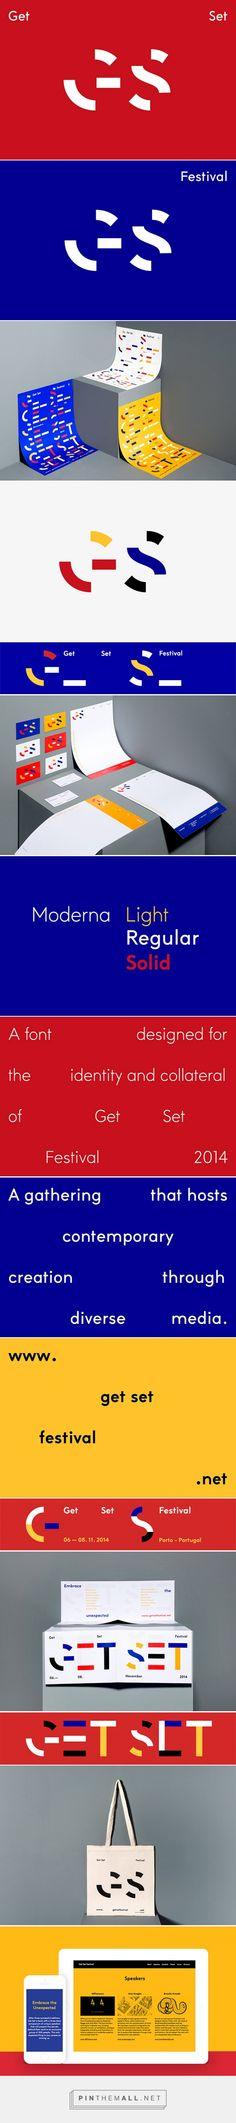 Get Set Festival – Visual Journal - created via https://pinthemall.net